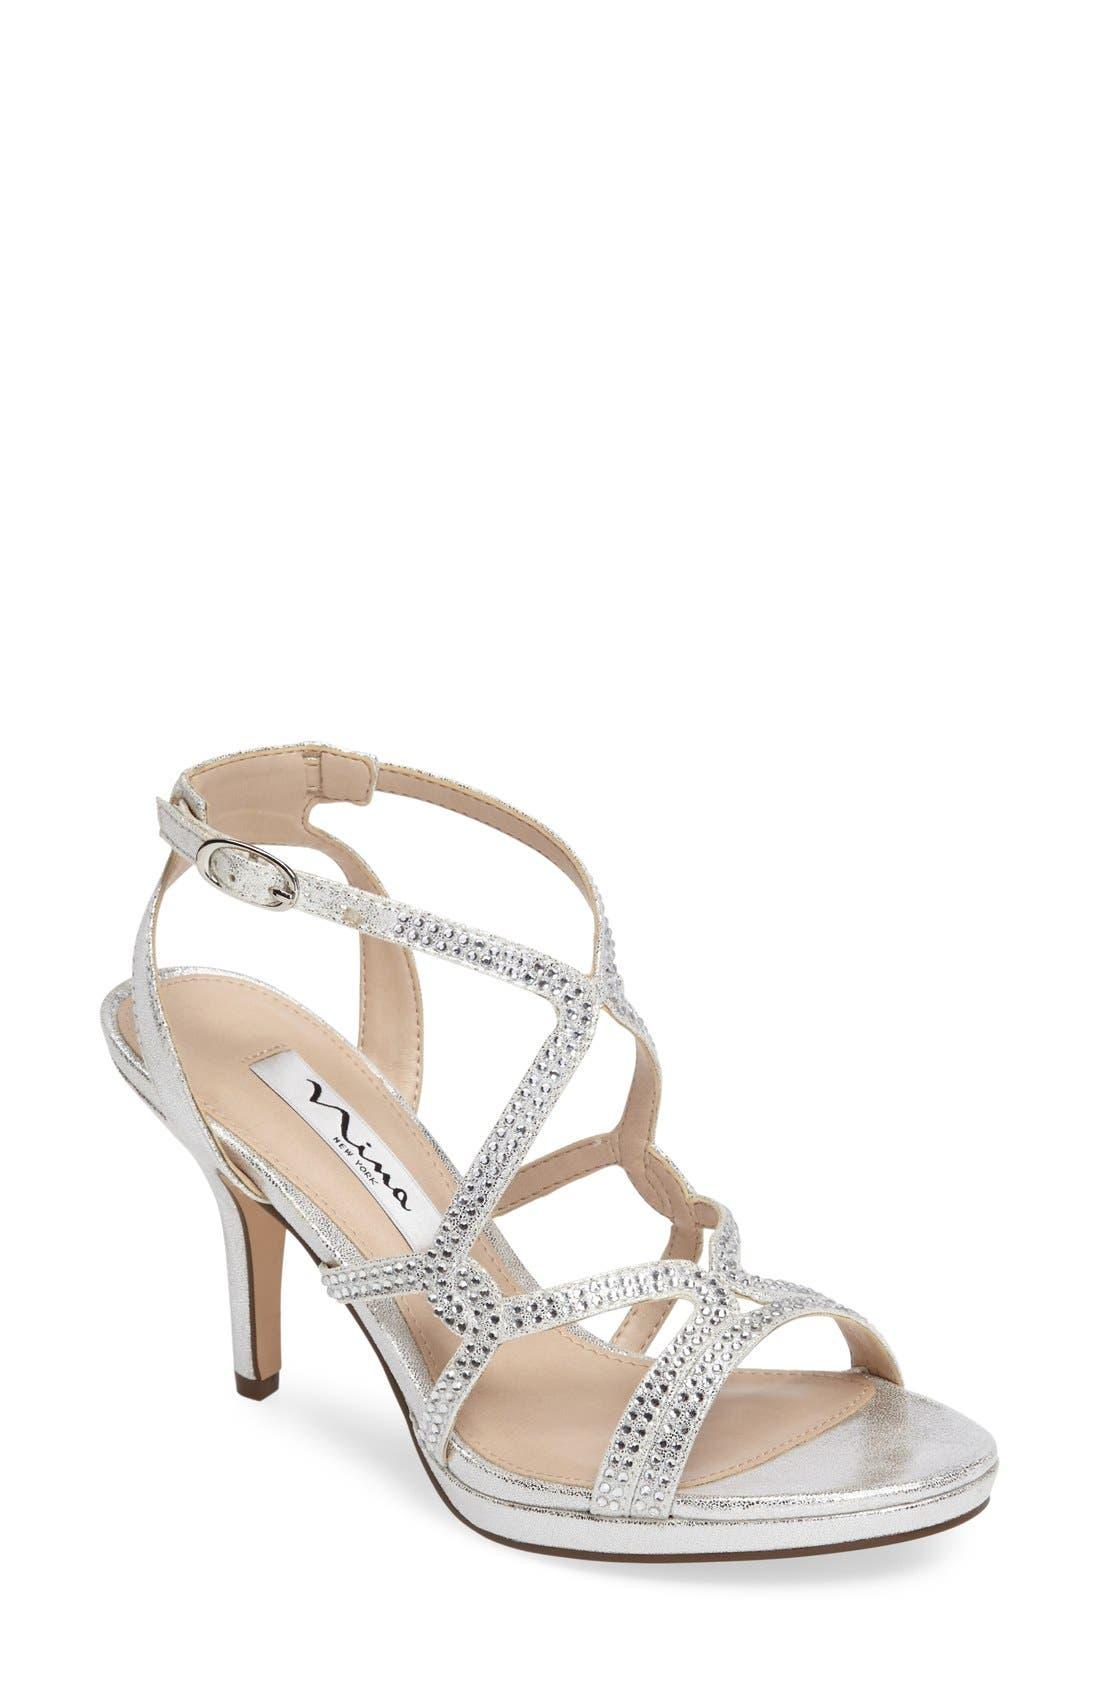 Varsha Crystal Embellished Evening Sandal,                             Main thumbnail 1, color,                             041